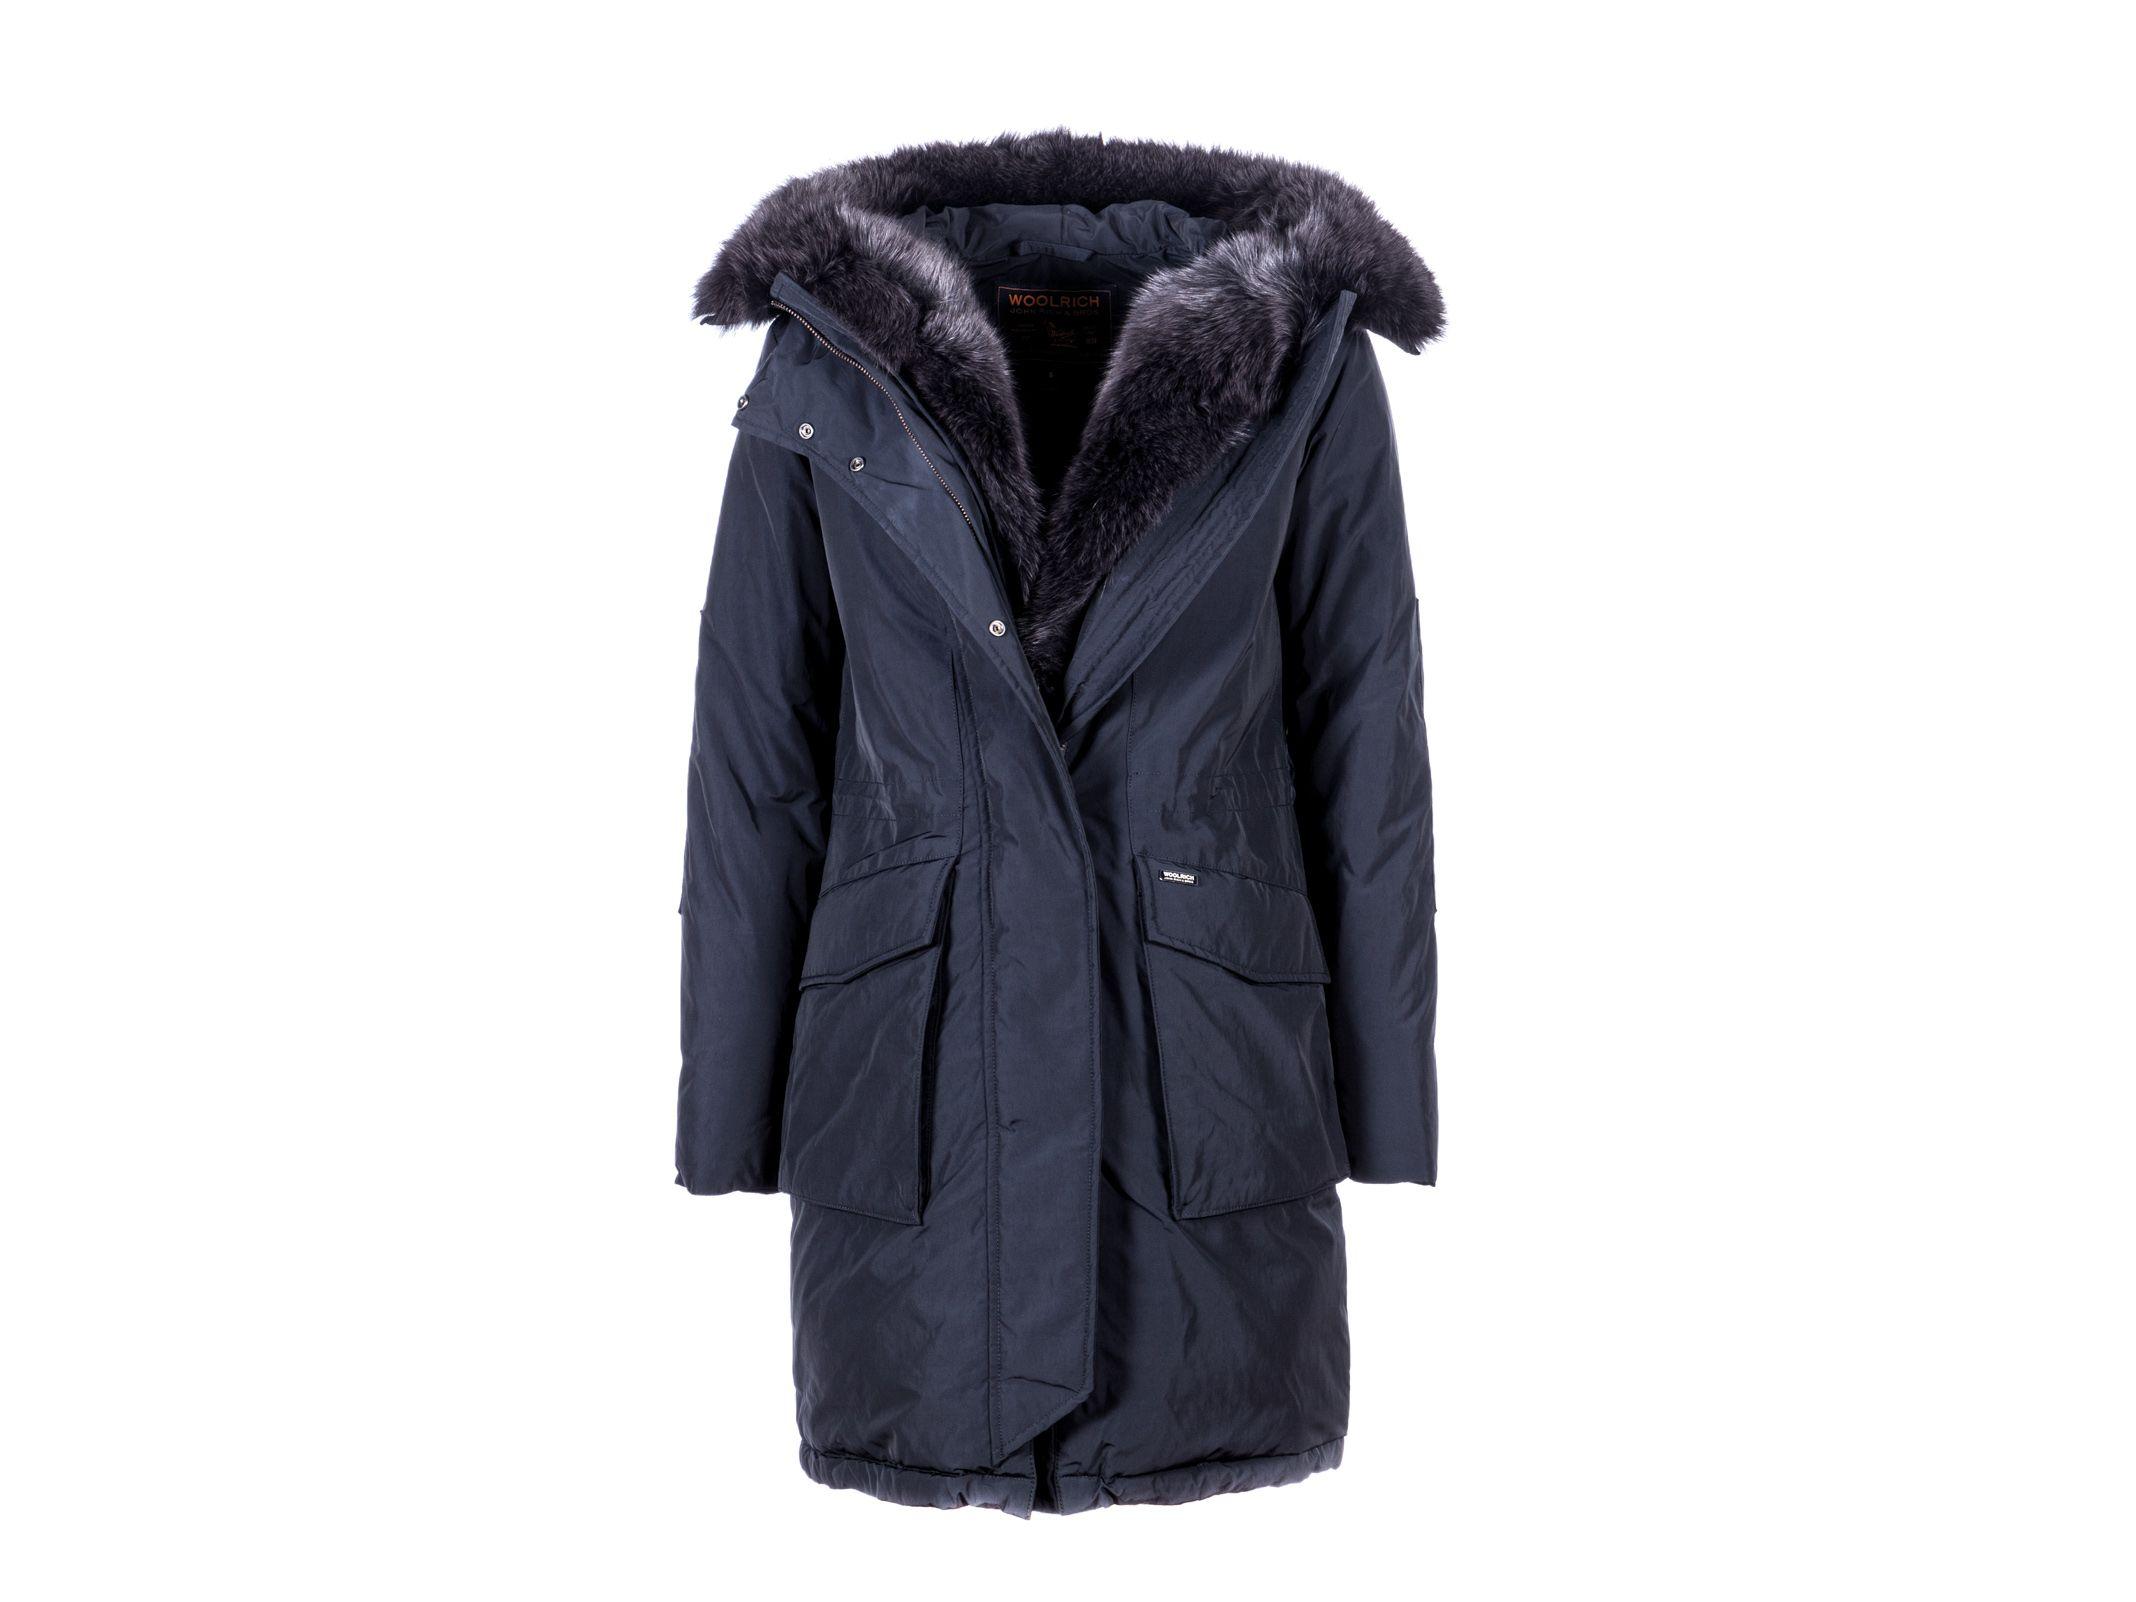 woolrich woolrich hooded military parka new fur blue. Black Bedroom Furniture Sets. Home Design Ideas